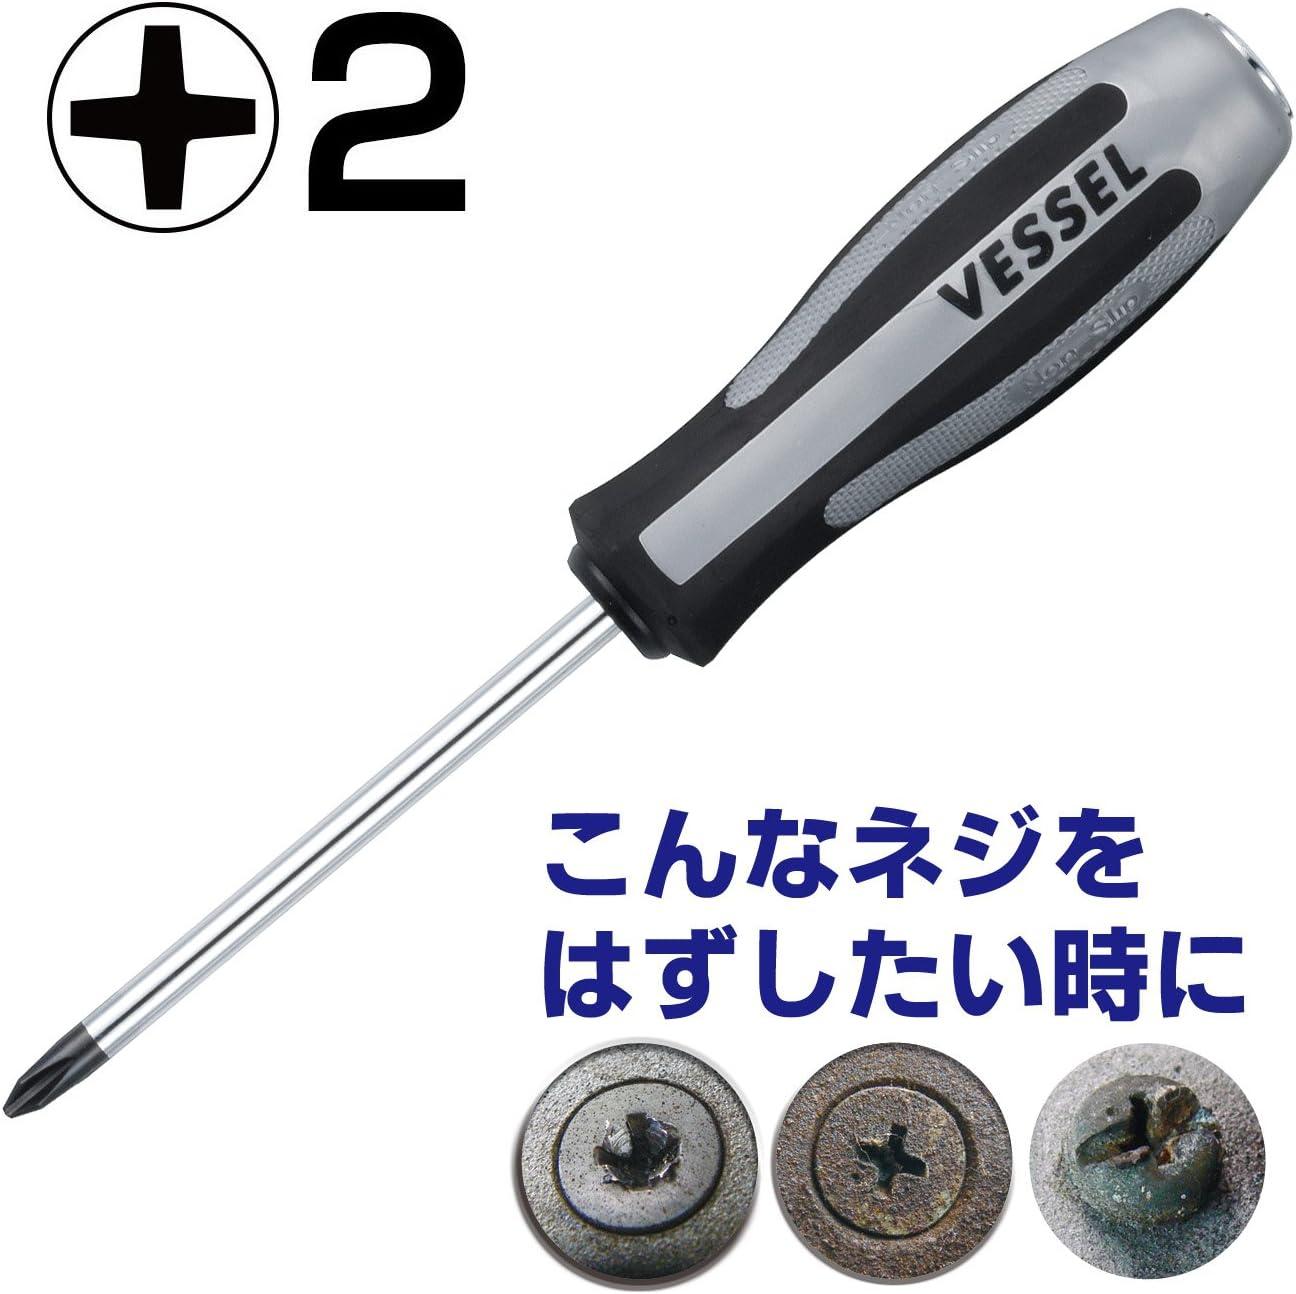 New VESSEL Bessel Megadora impactor 2X100 Screw Driver Plus Made in Japan p/&p